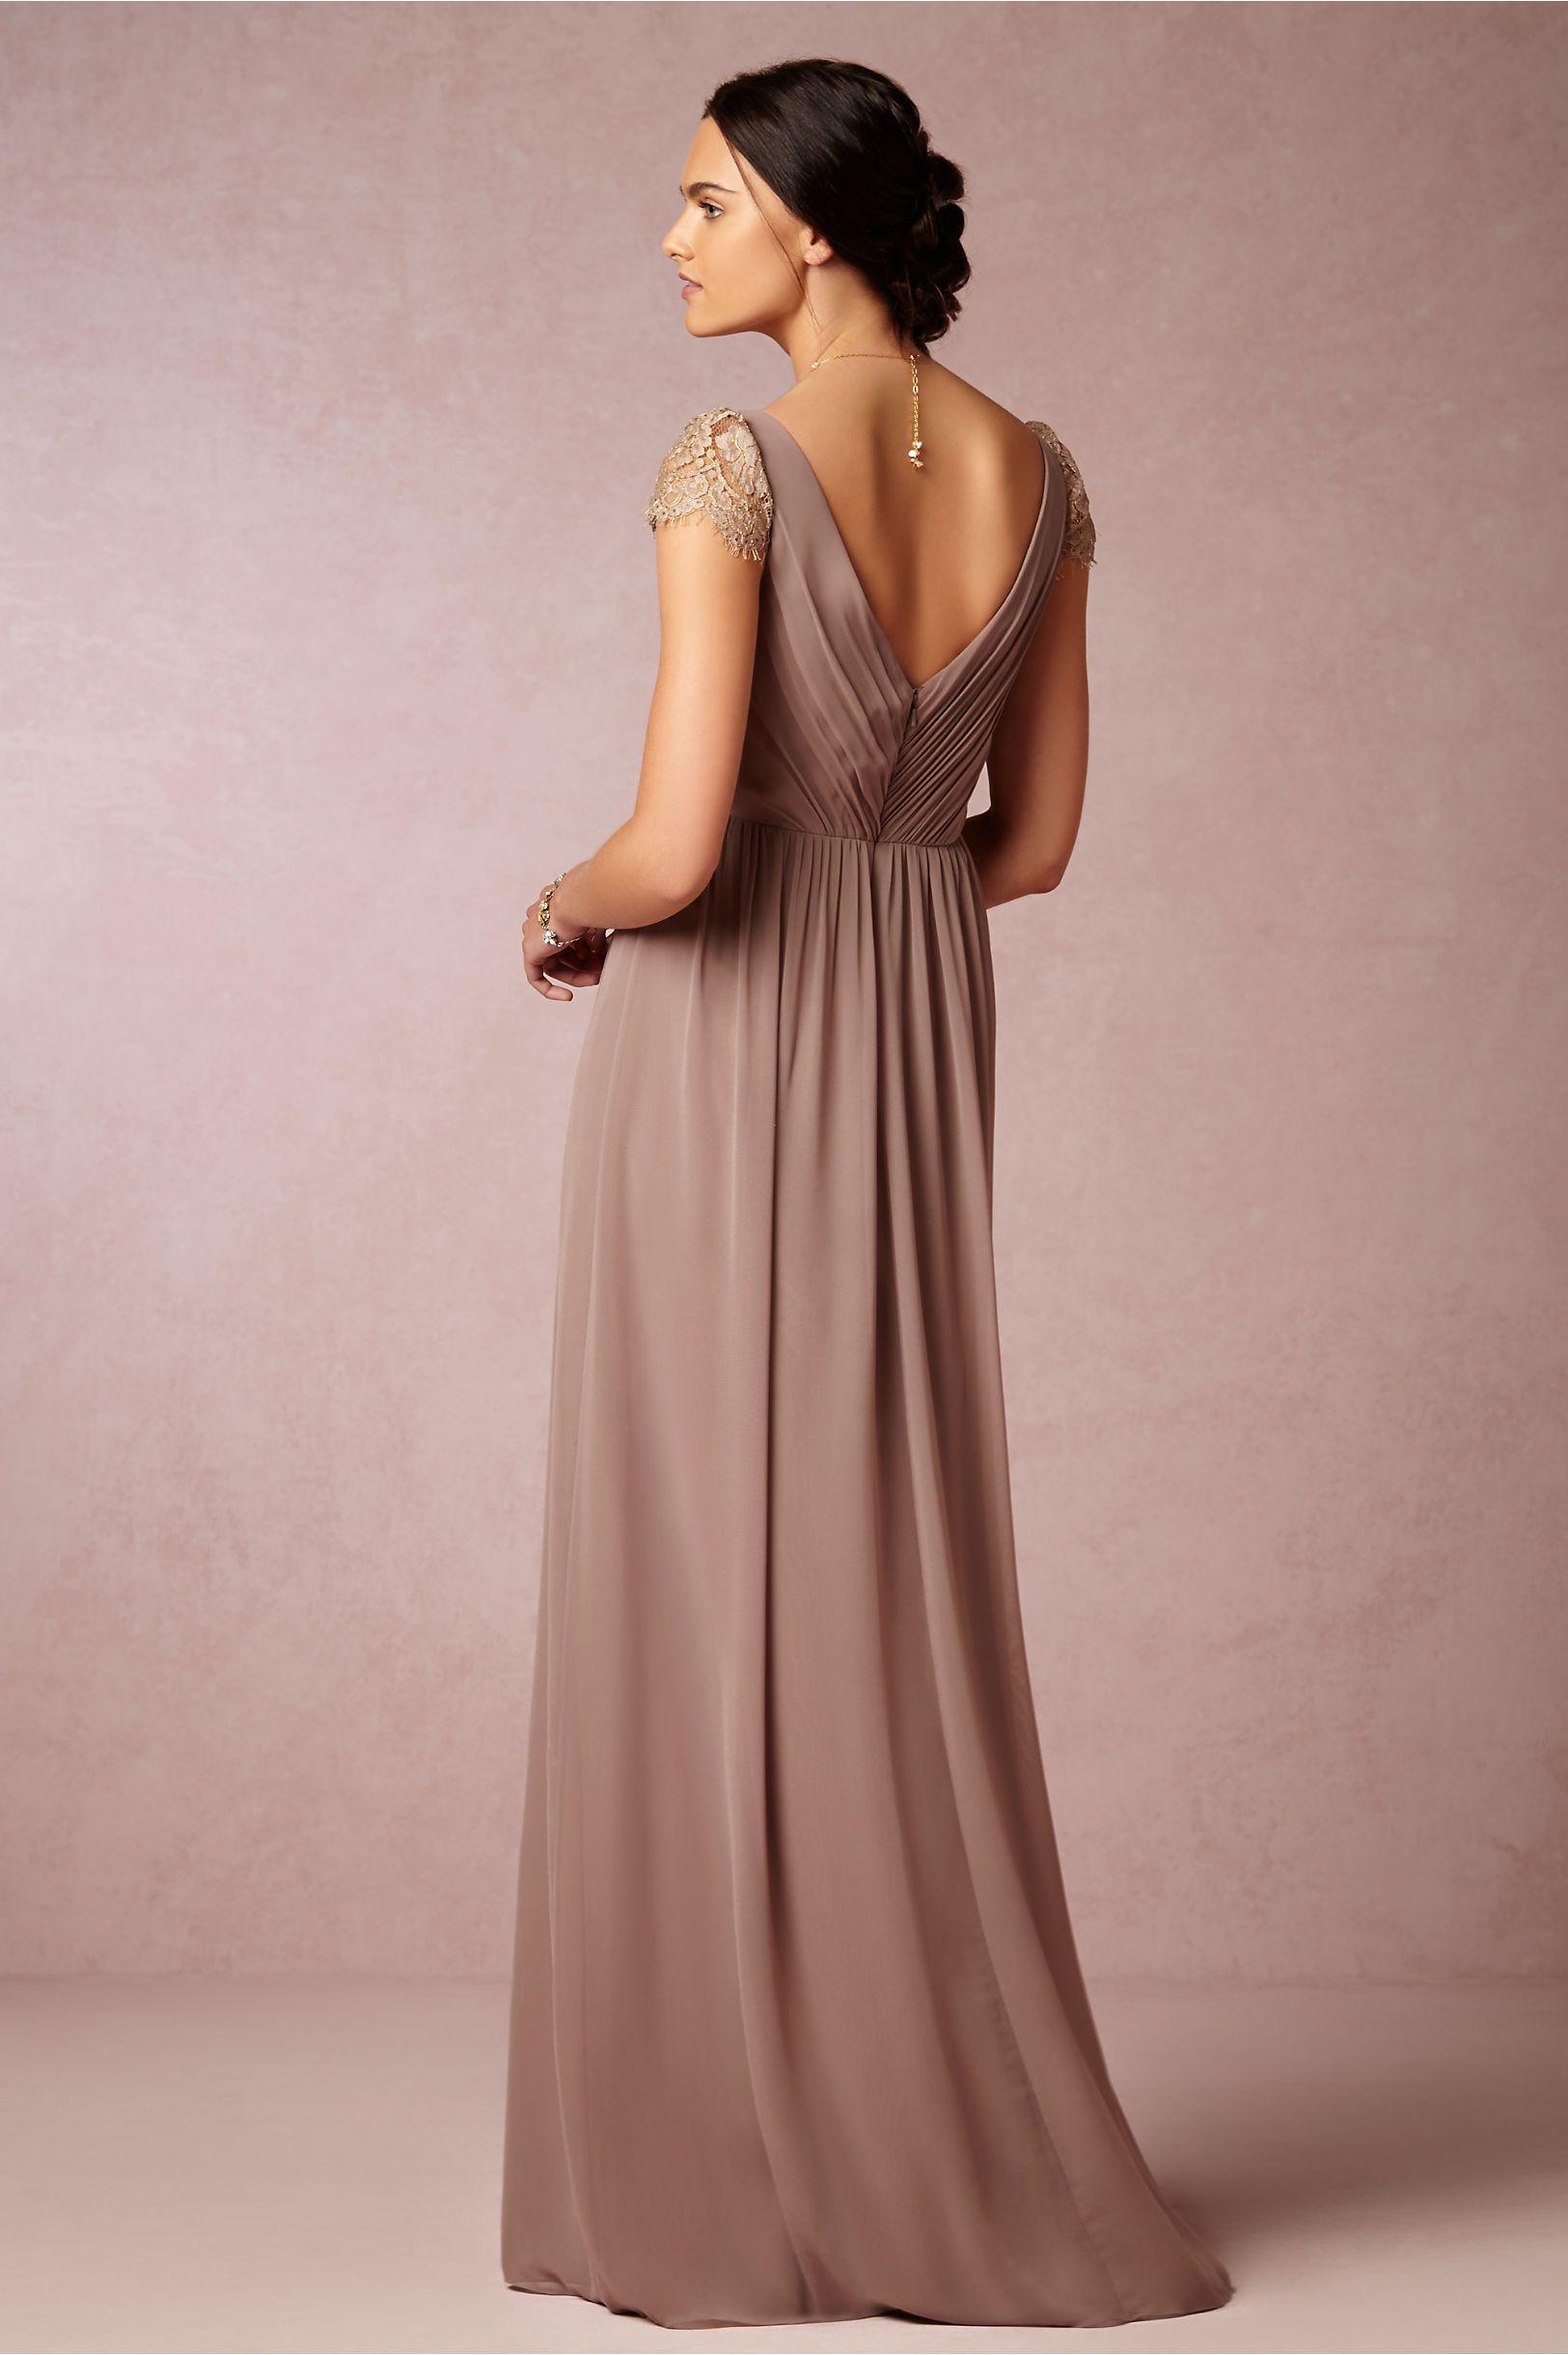 Evangeline Dress in dust mauve from BHLDN | The Bohemian Bride ...